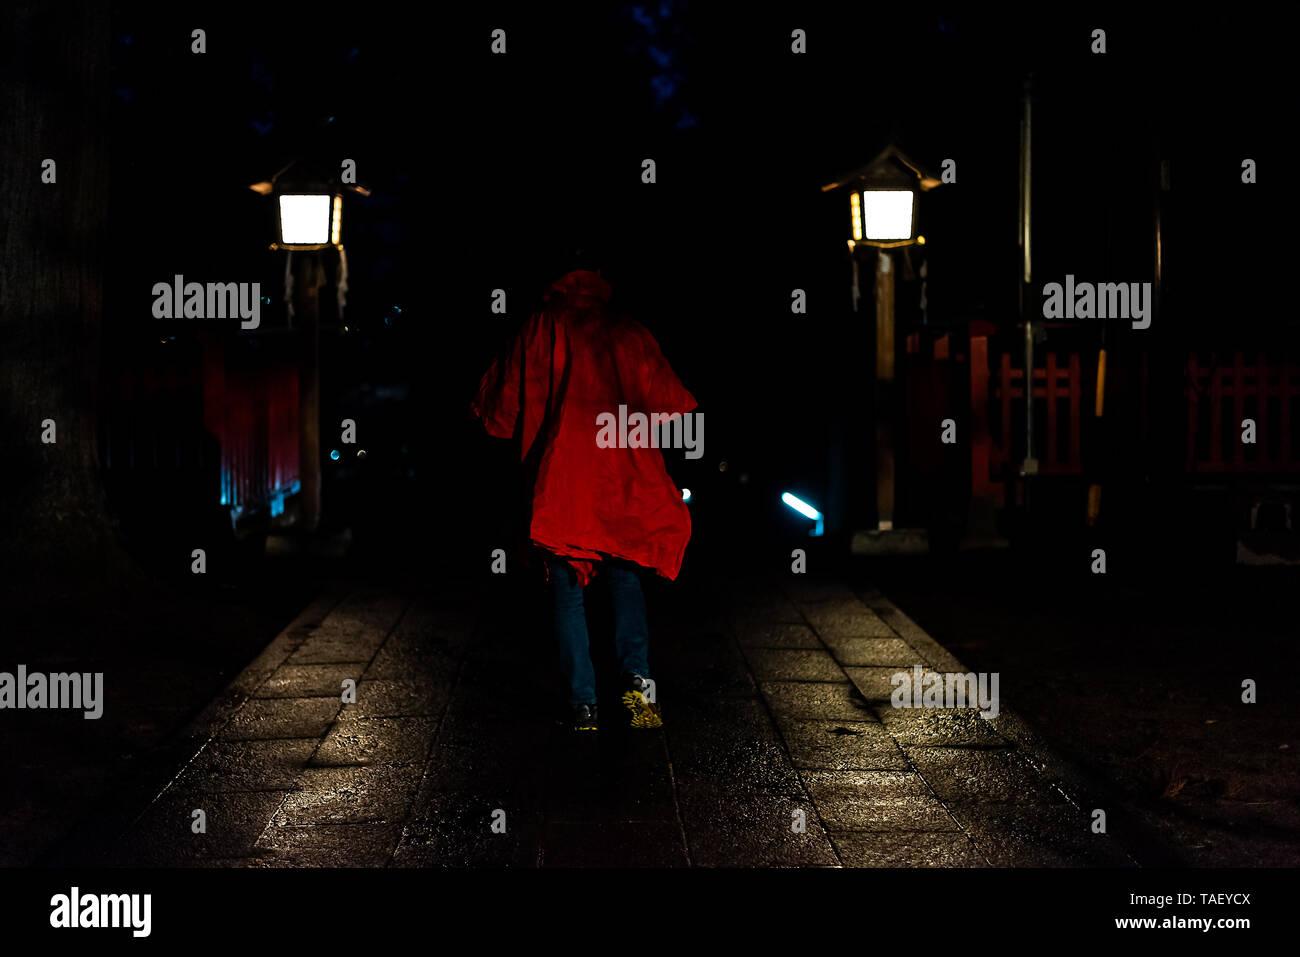 Higashiyama Hakusan Shrine in Takayama, Gifu Prefecture in Japan with man in poncho by entrance to temple building in dark night creepy spooky - Stock Image